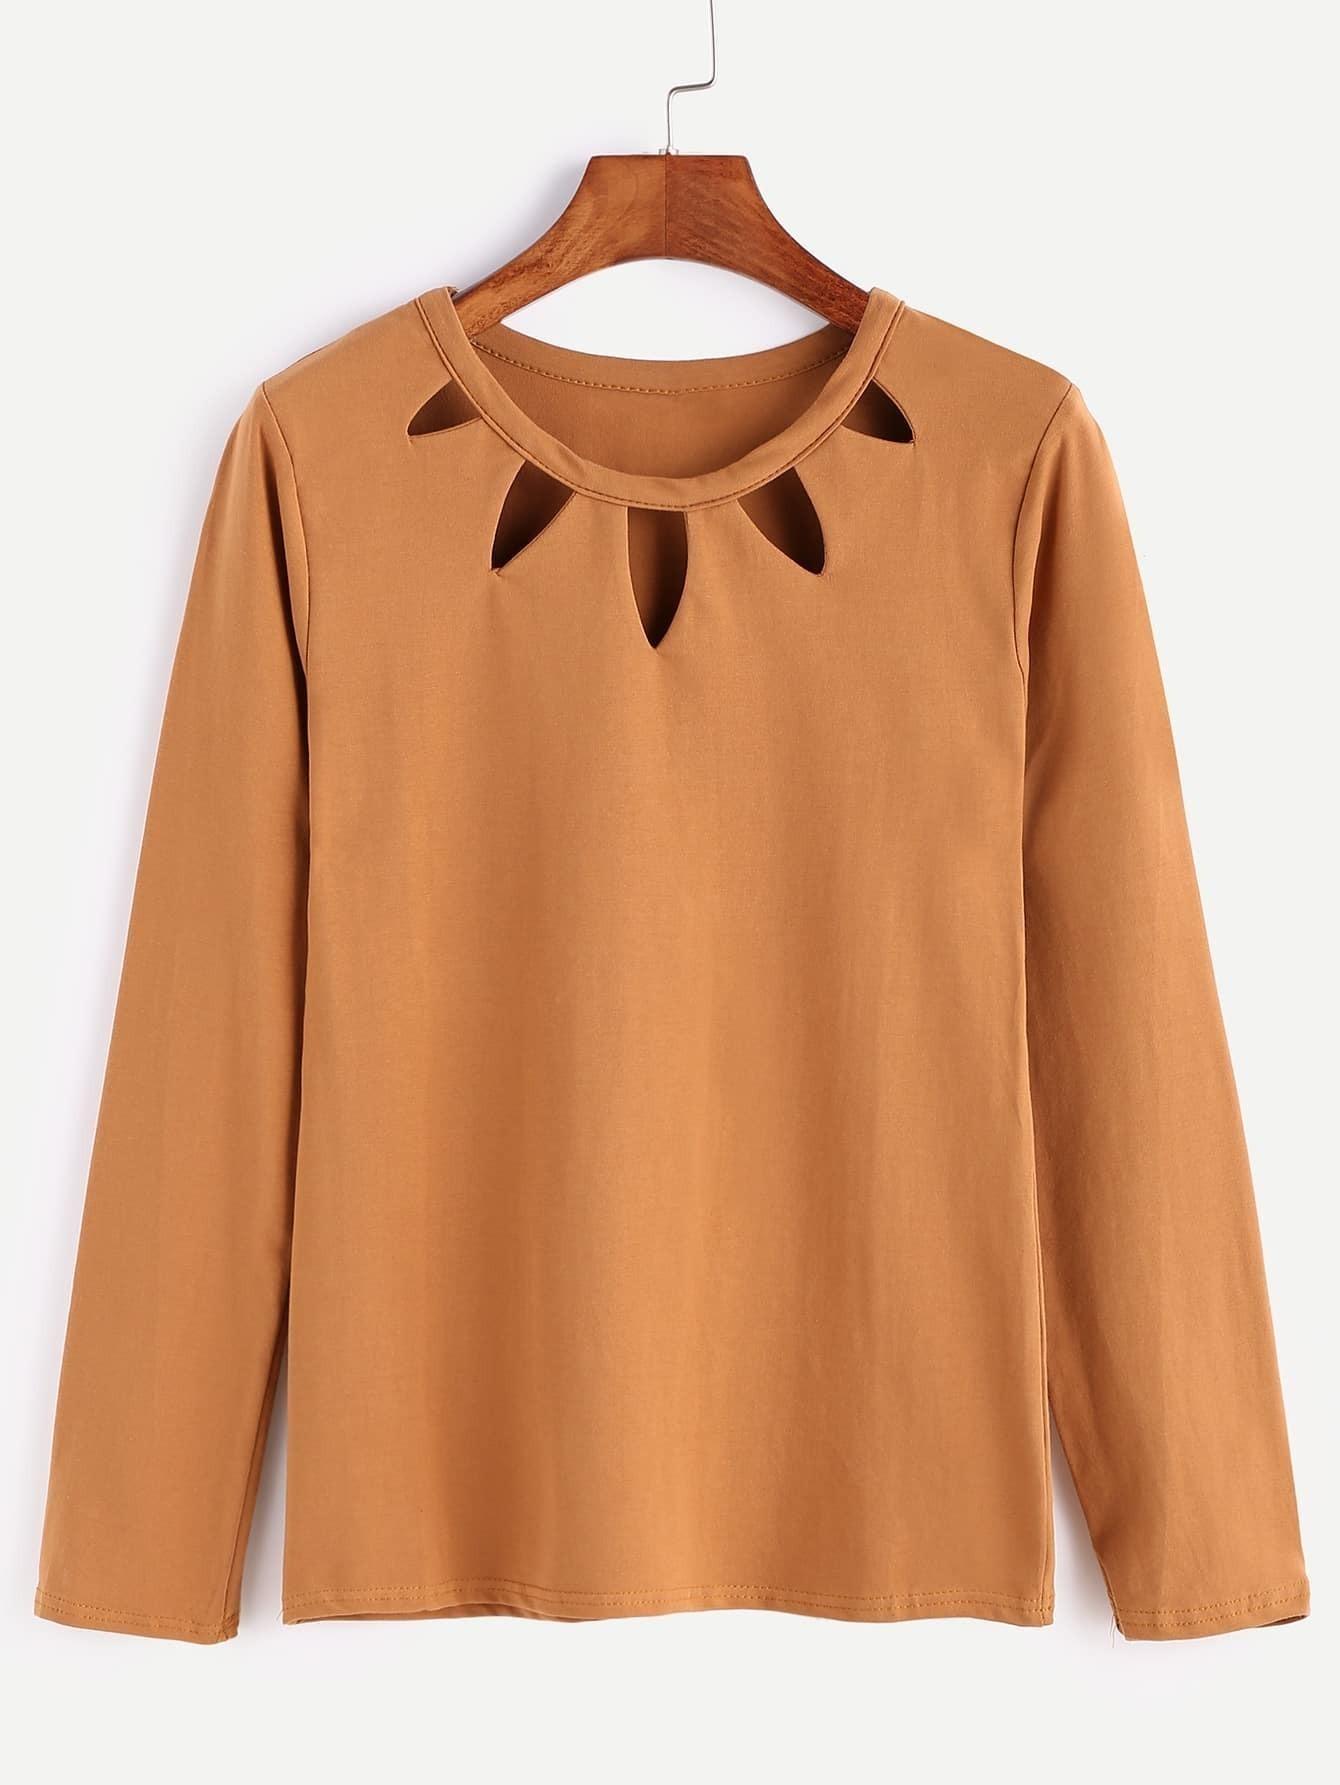 Khaki Cut Out Front Long Sleeve T Shirtfor Women Romwe